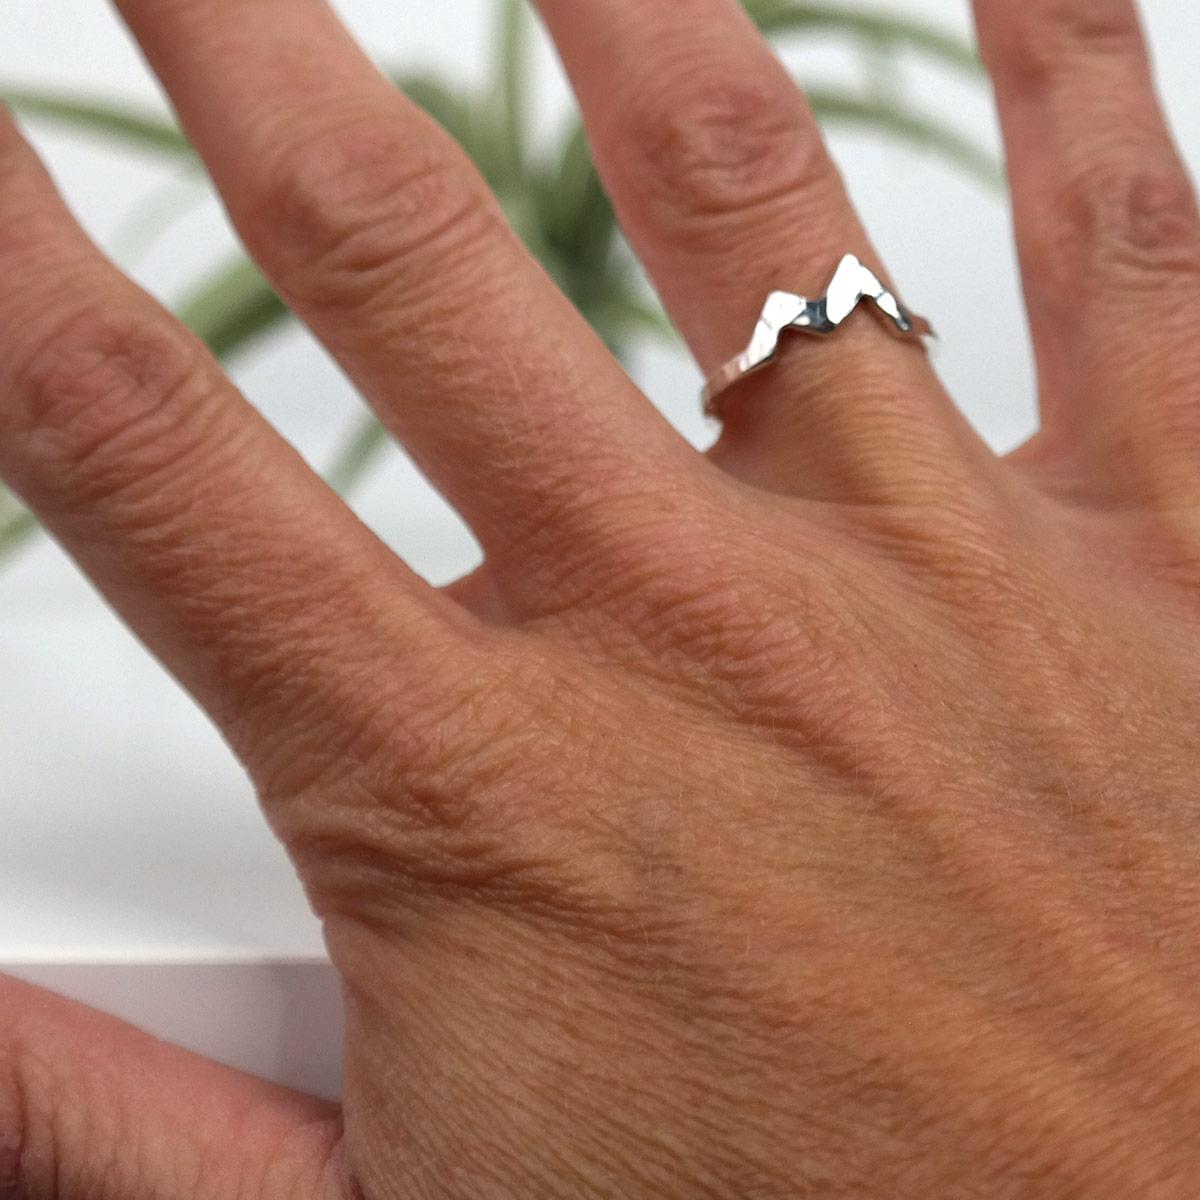 wearing hammered mountain ring